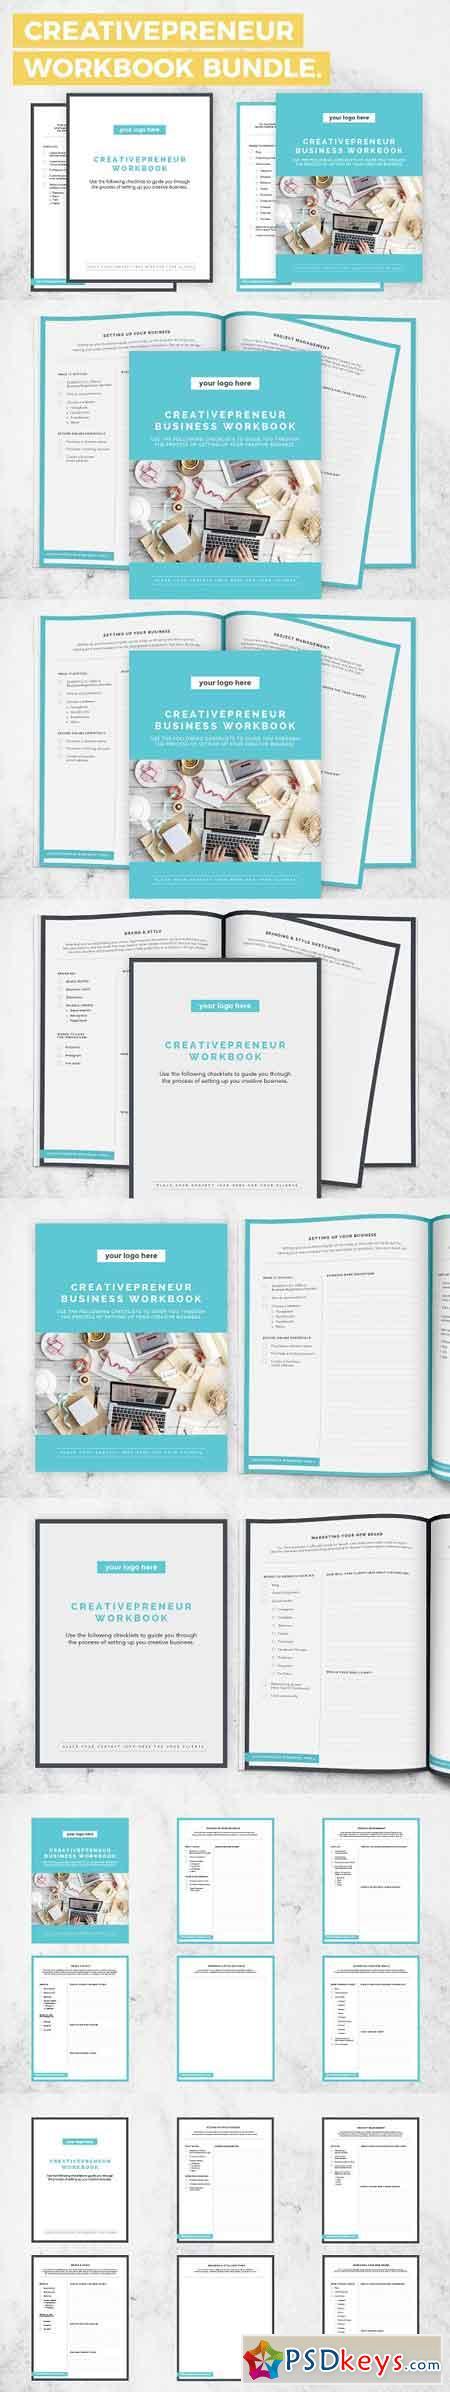 BUNDLE! Creativepreneur Workbooks 1283293   de PSDKEYS   Diagram